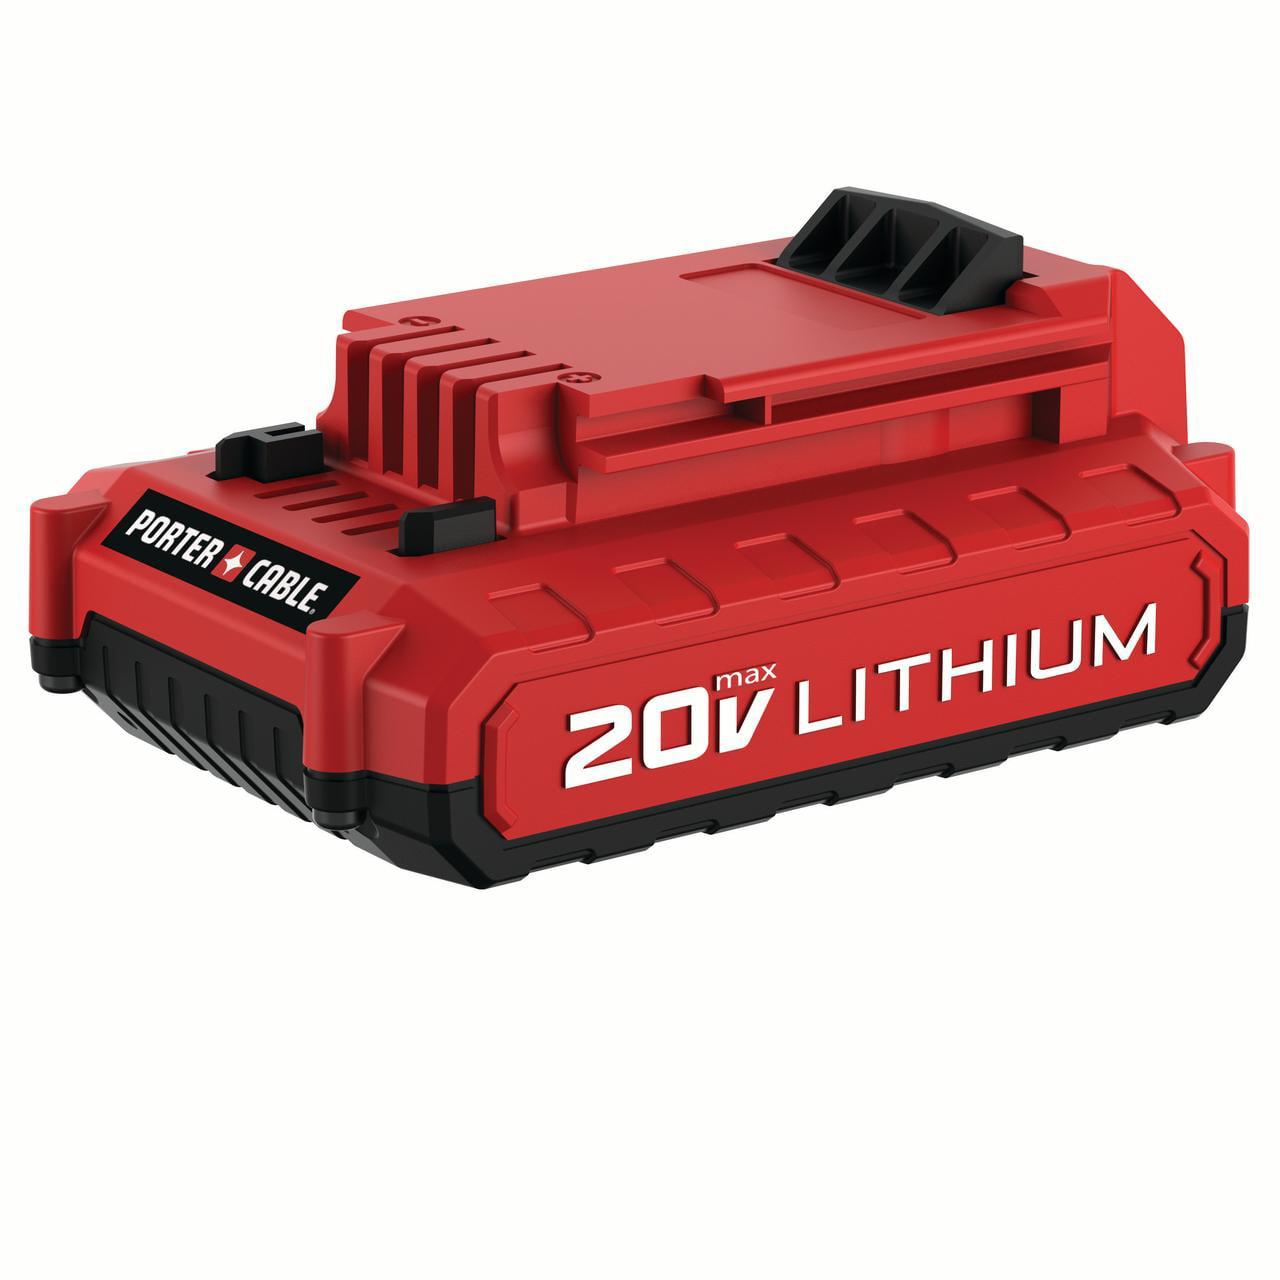 PORTER CABLE 20-Volt Max 2.0-Amp Lithium-Ion Battery, PCC682L